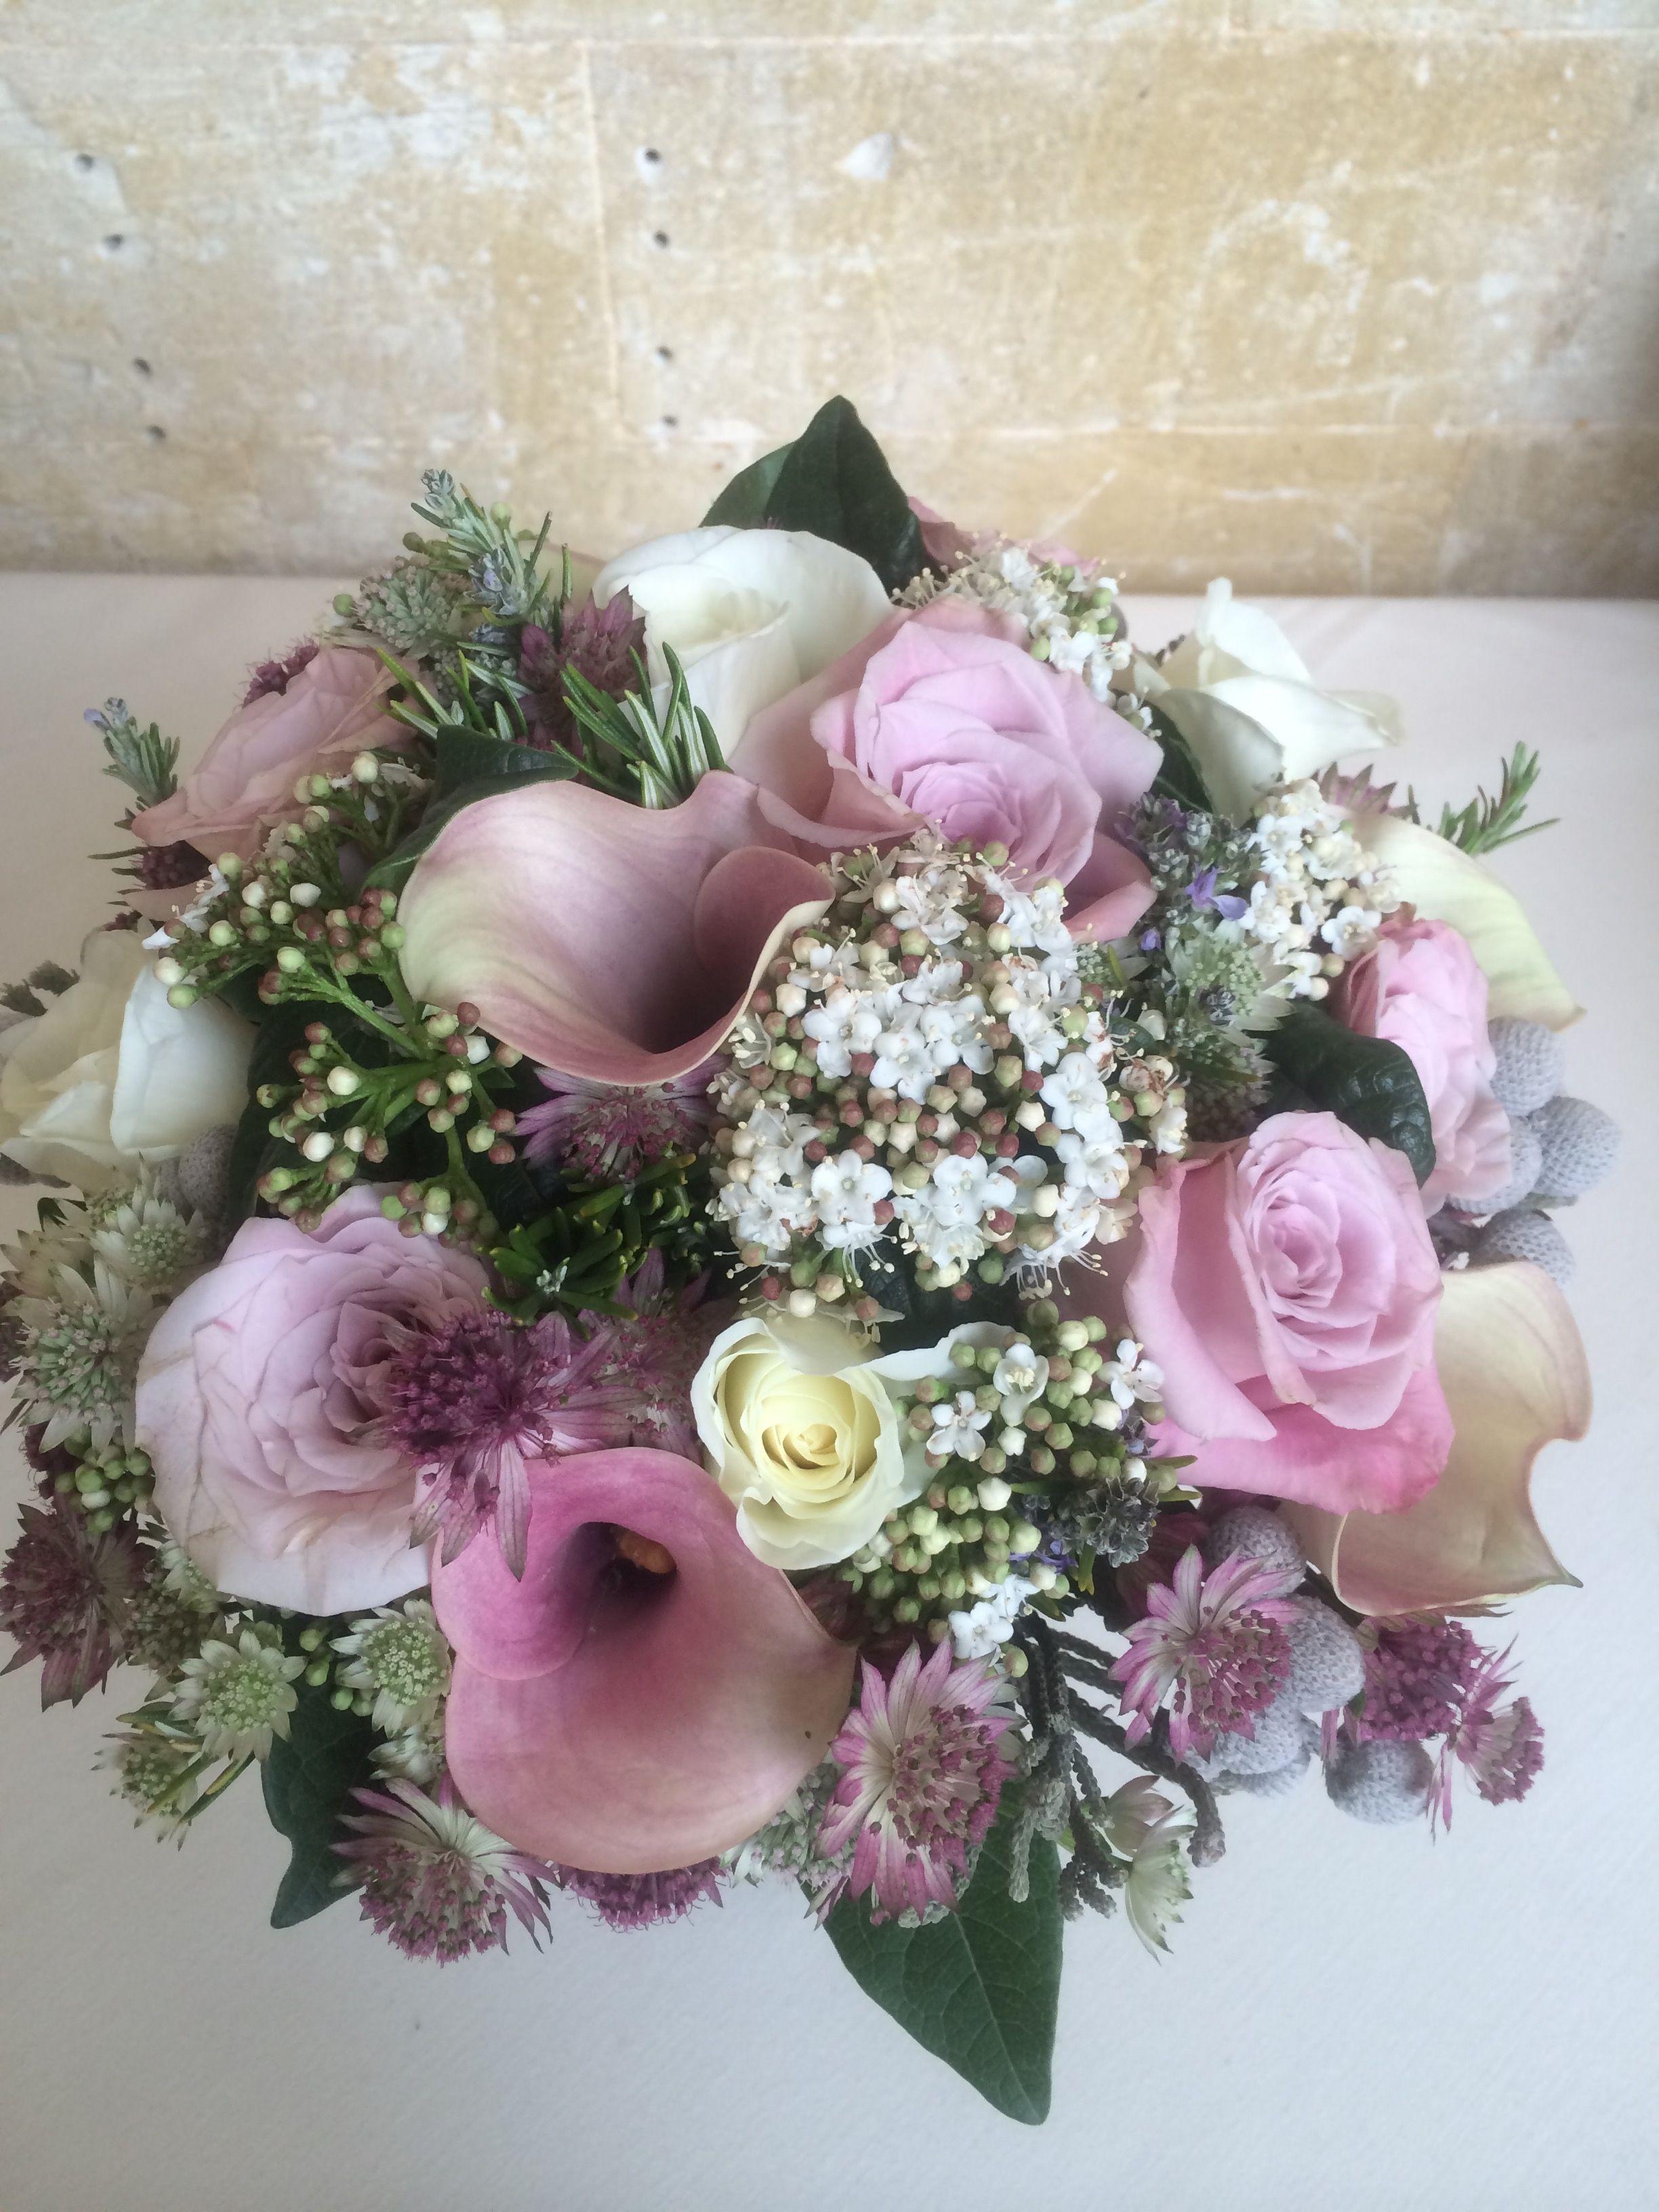 Bridal bouquet by viva creative flower company wedding florist bridal bouquet by viva creative flower company wedding florist rickmansworth hertfordshire izmirmasajfo